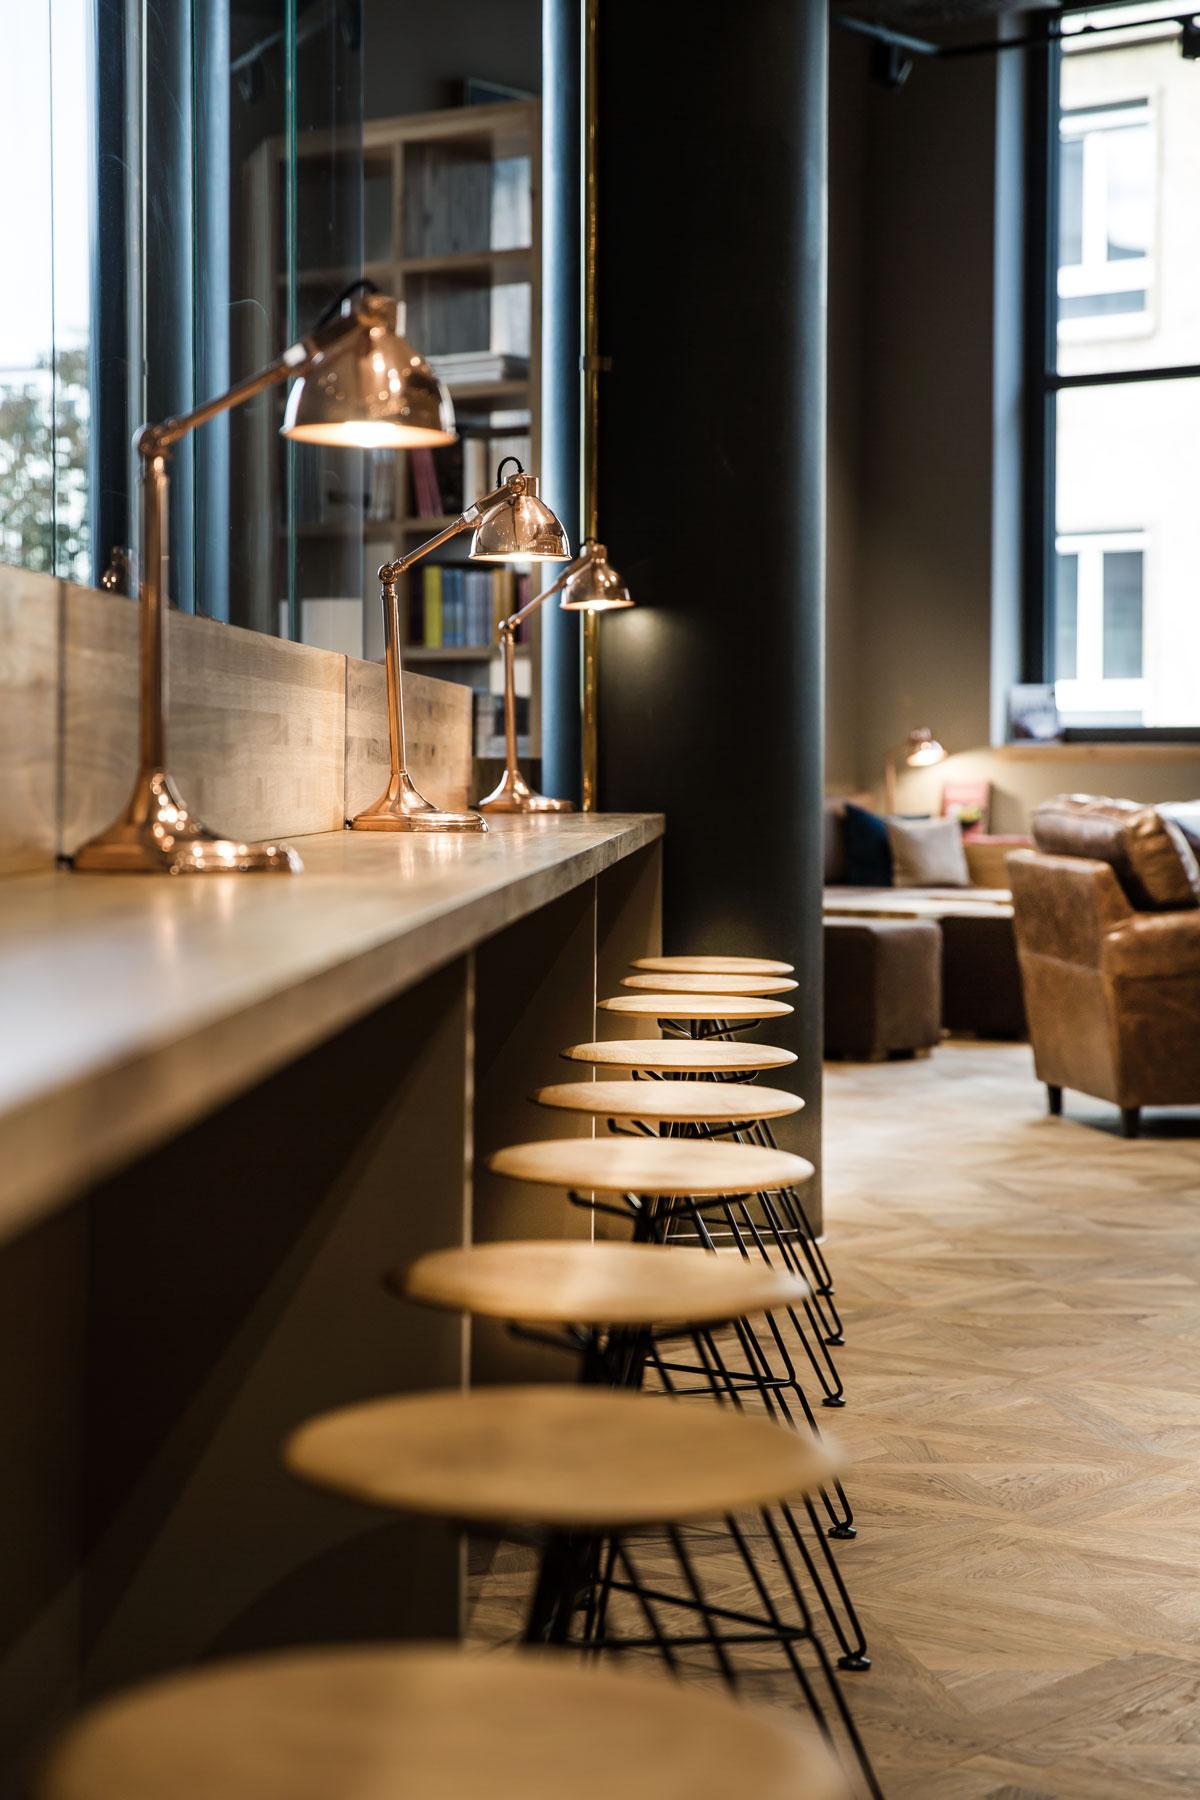 pano Brot & Kaffee, Stuttgart